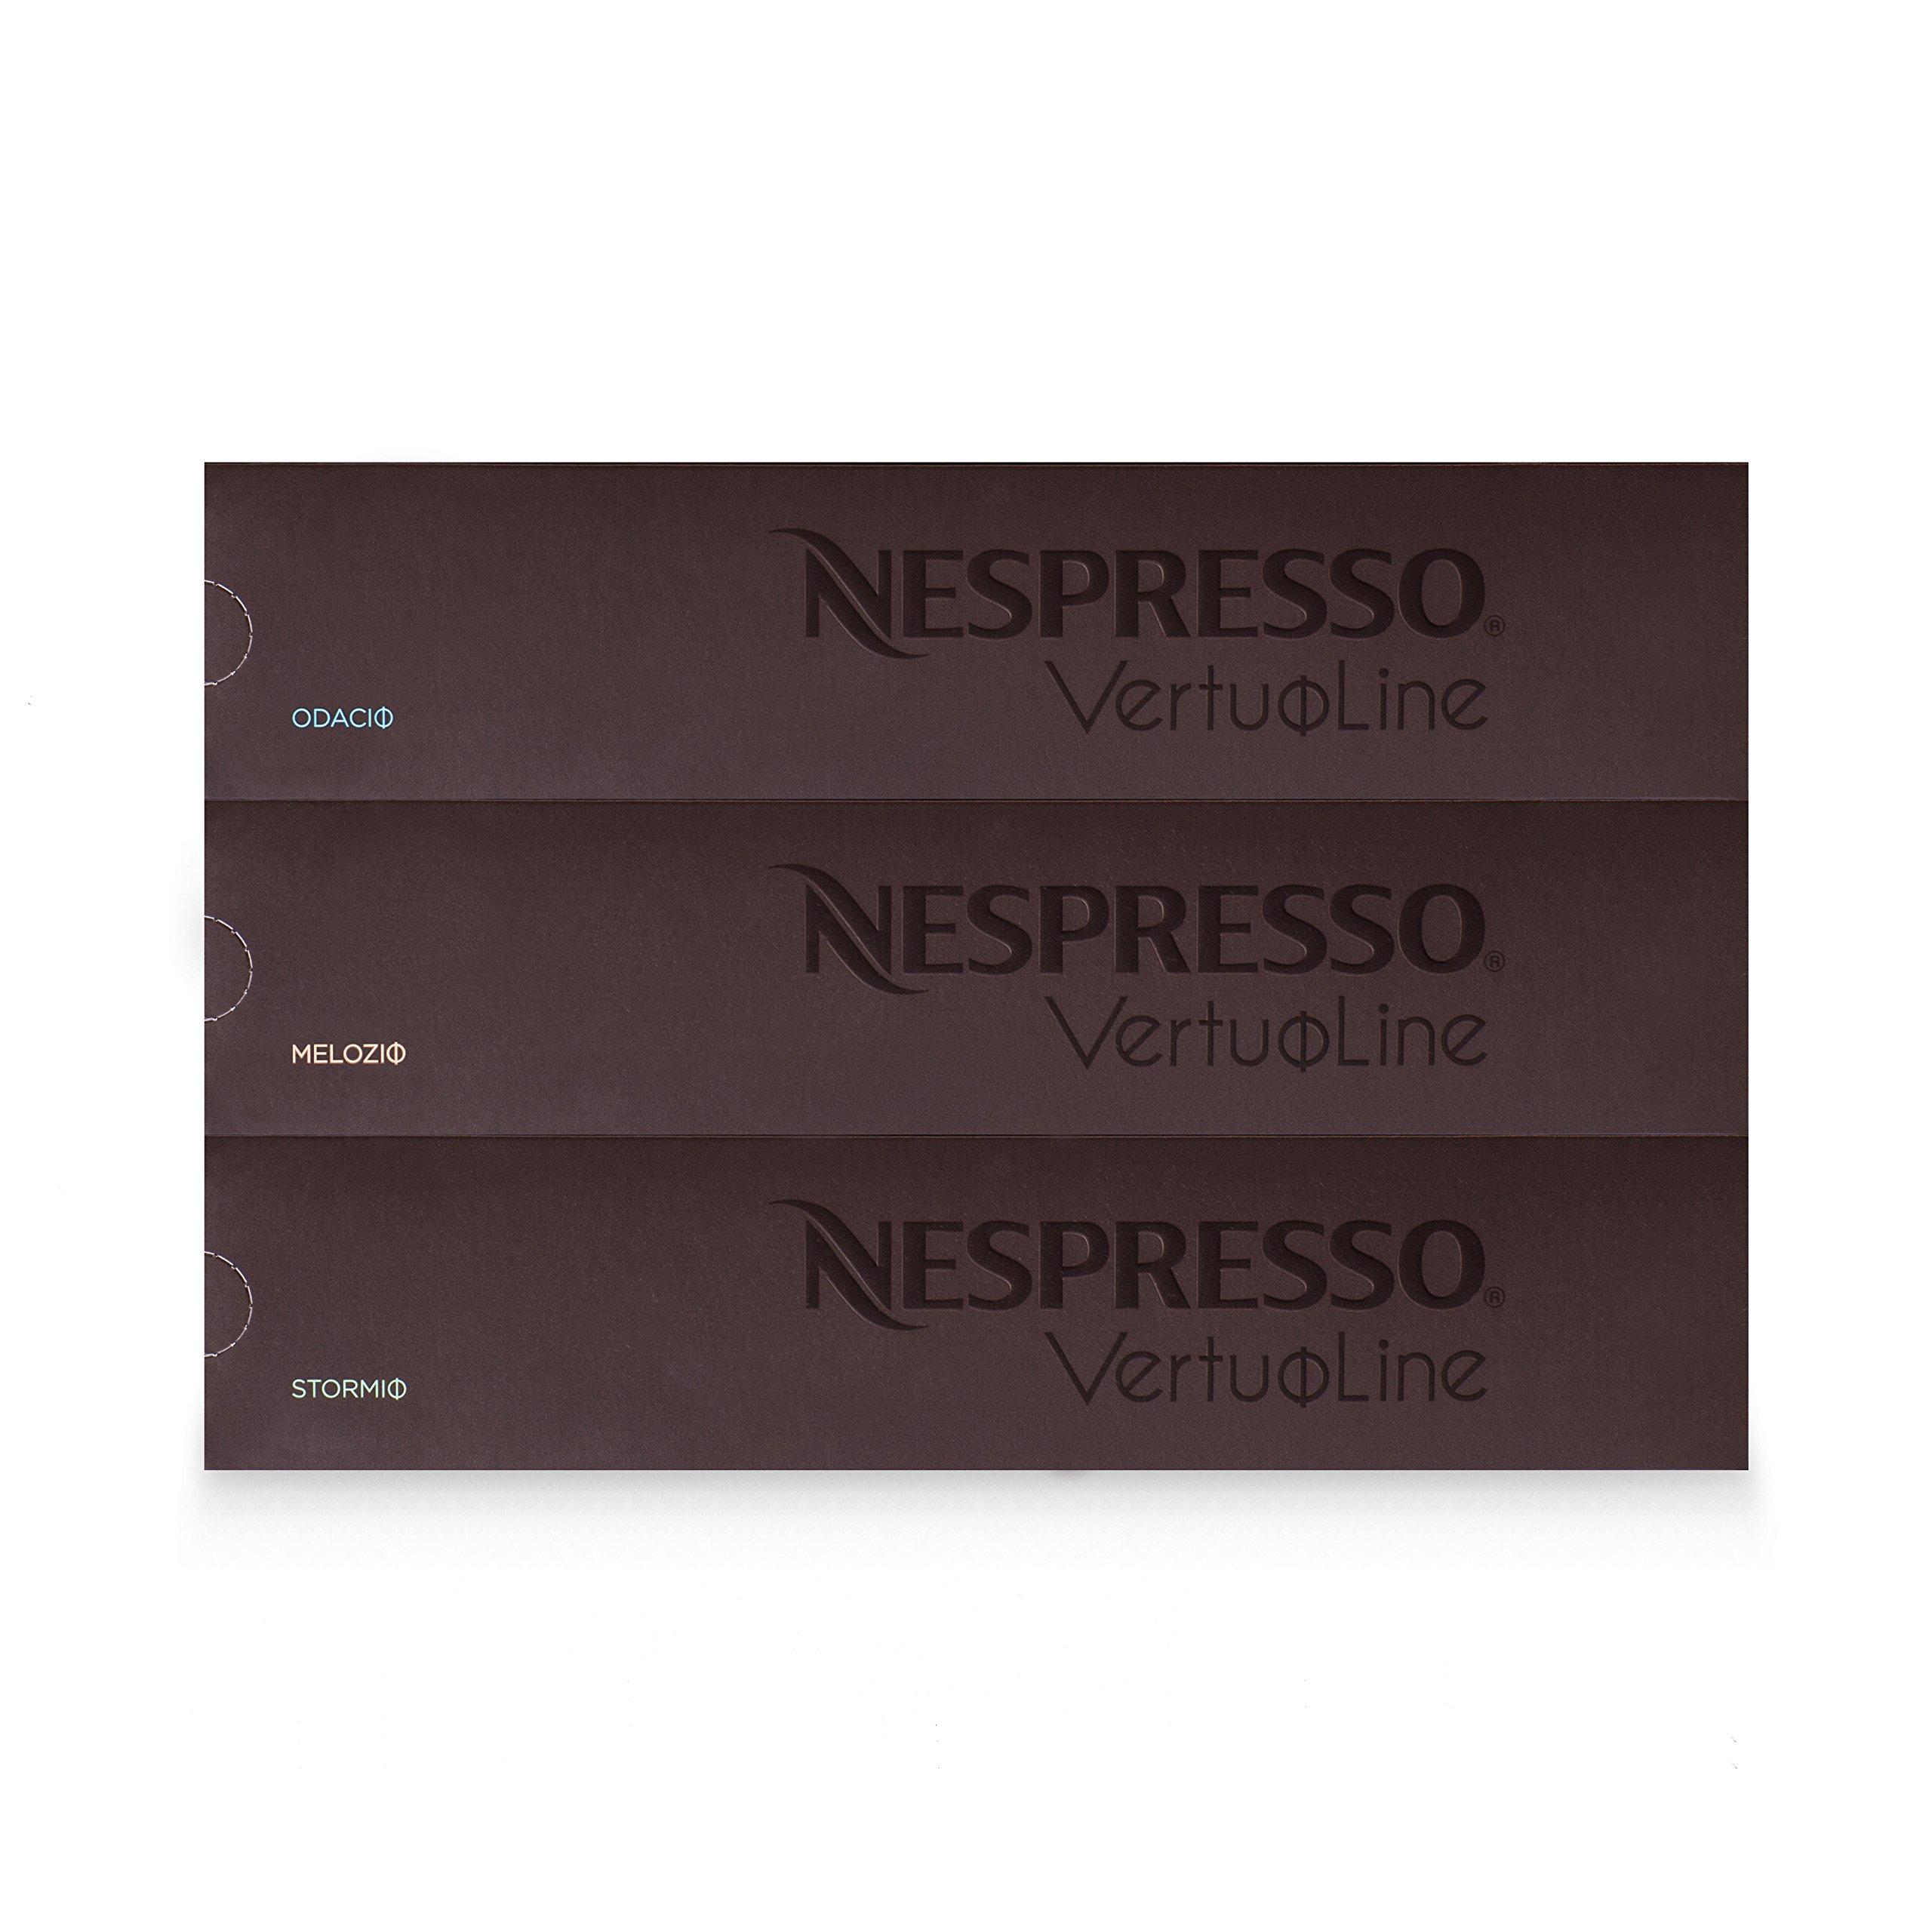 Nespresso Vertuoline Best Seller Assortment, 10 Count (Pack of 3) by Nespresso (Image #4)